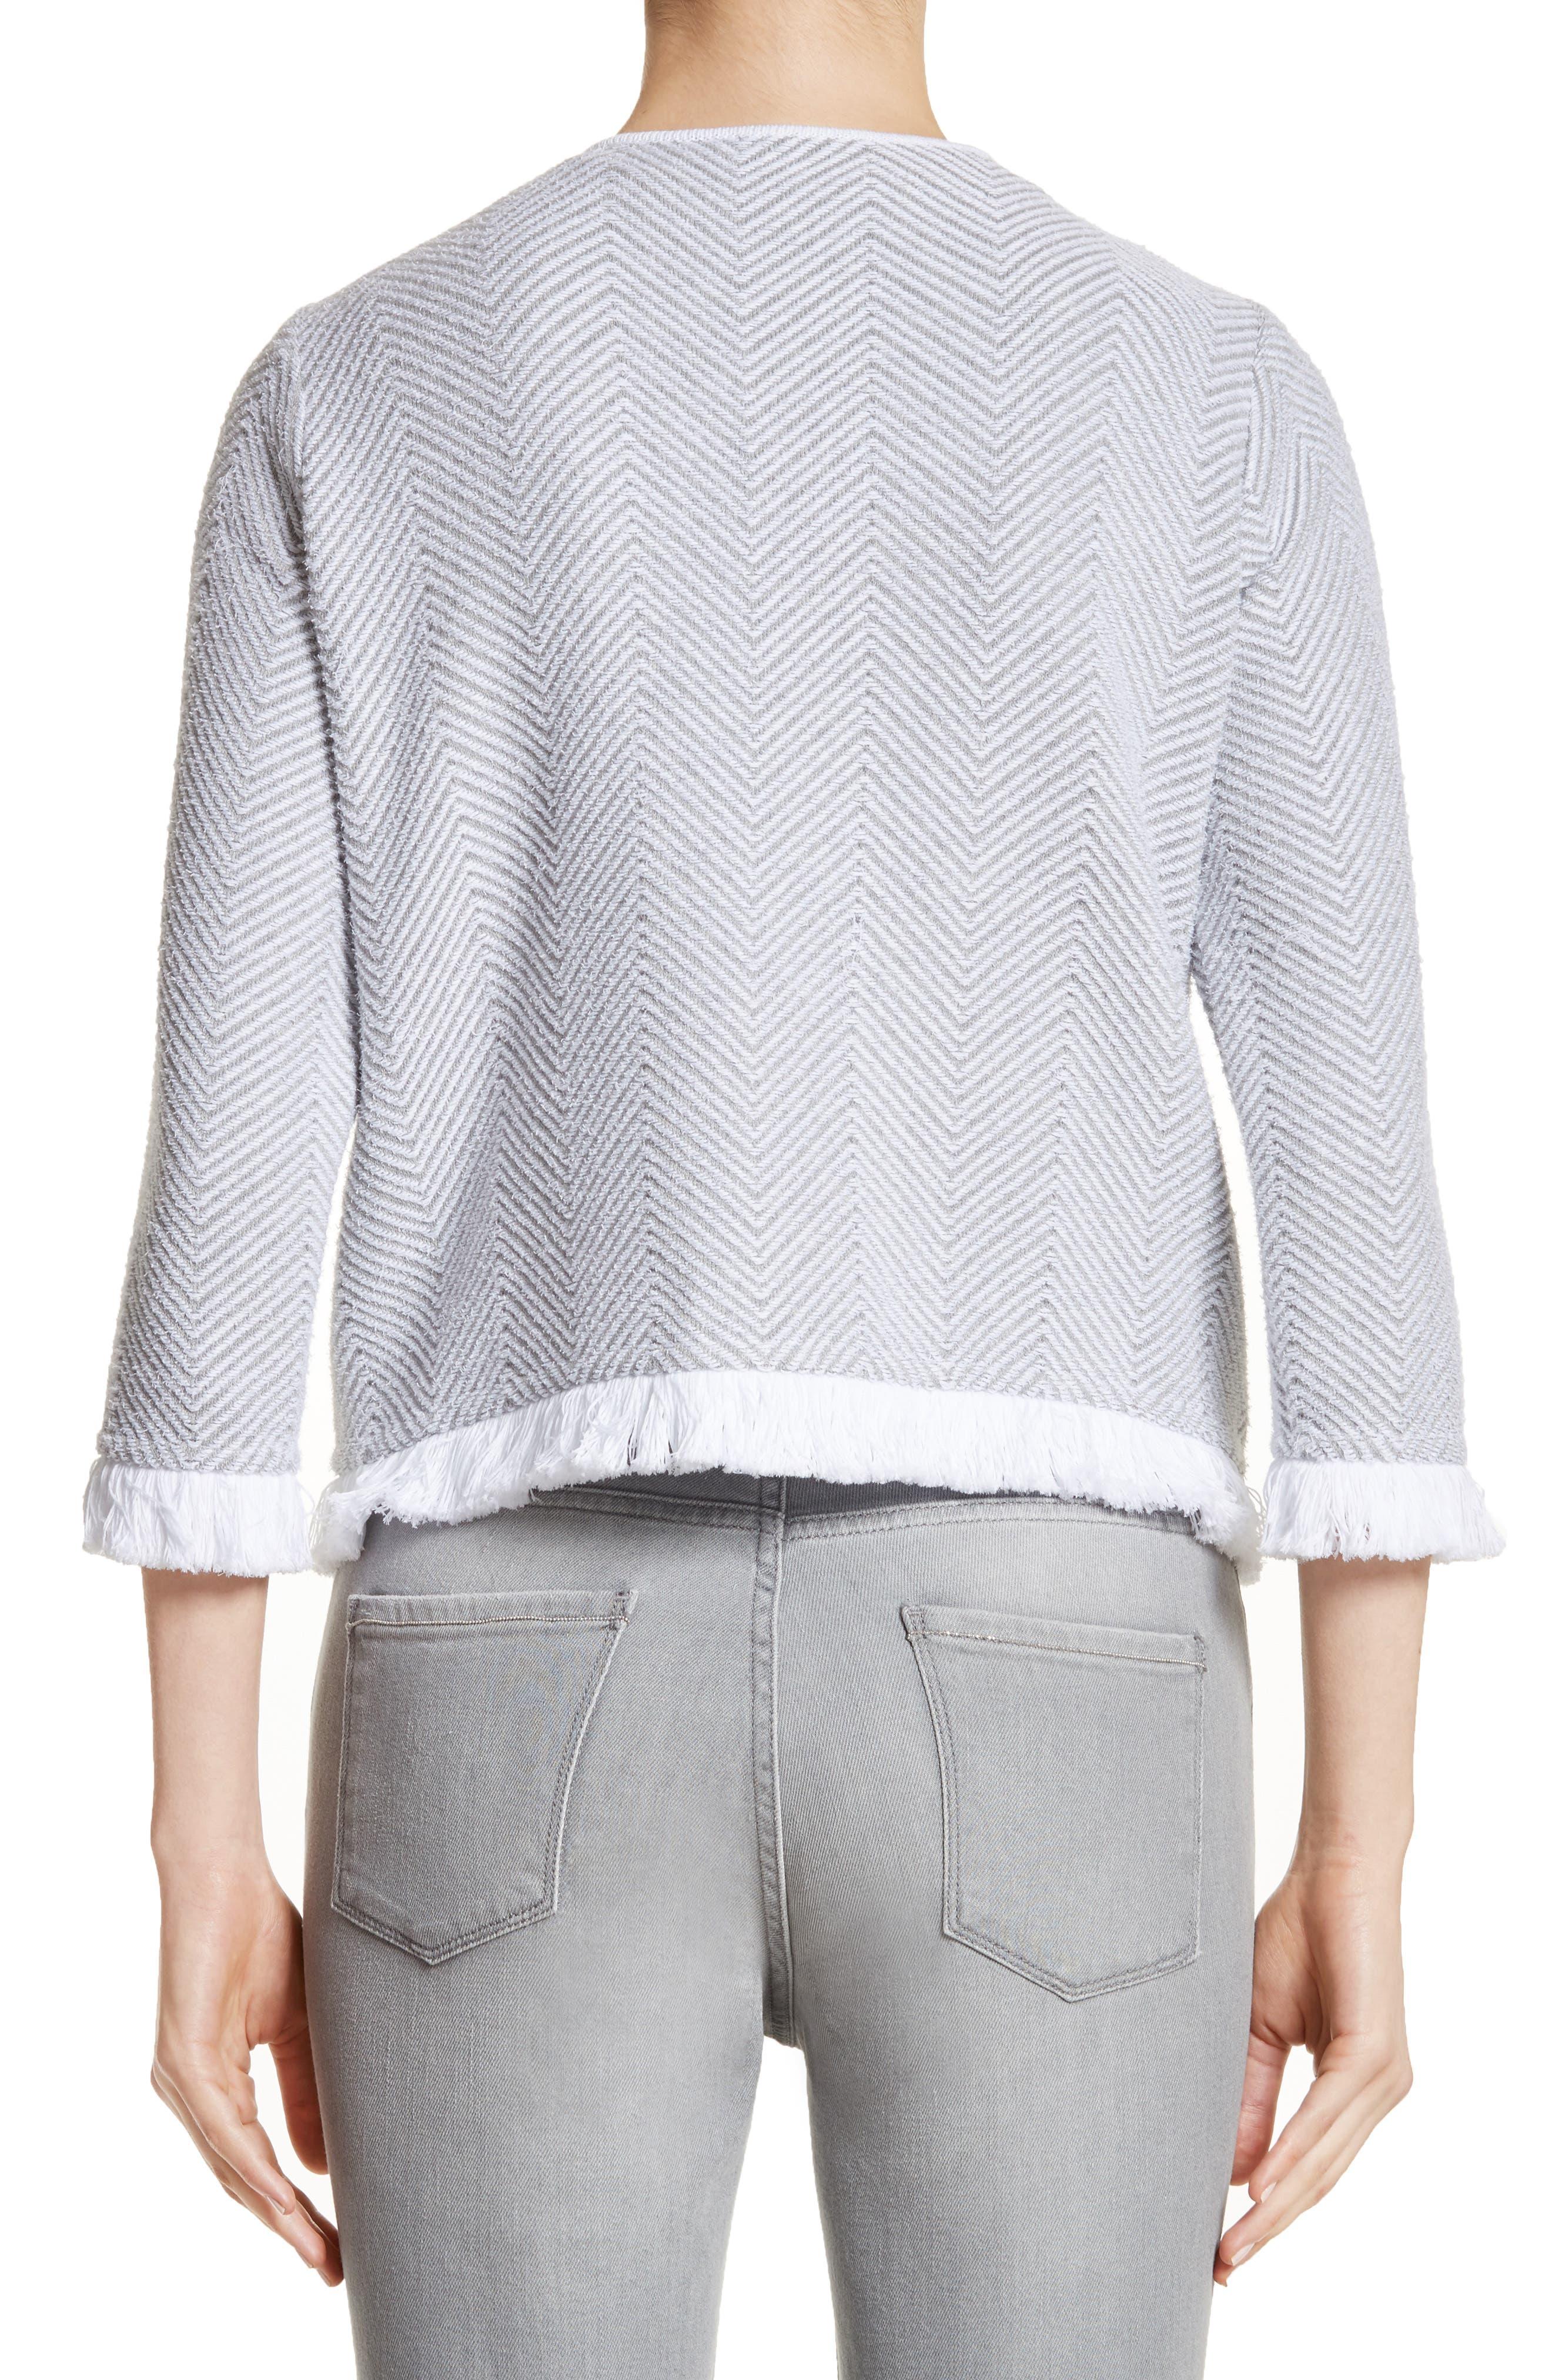 Alternate Image 2  - Fabiana Filippi Chevron Knit Jacket